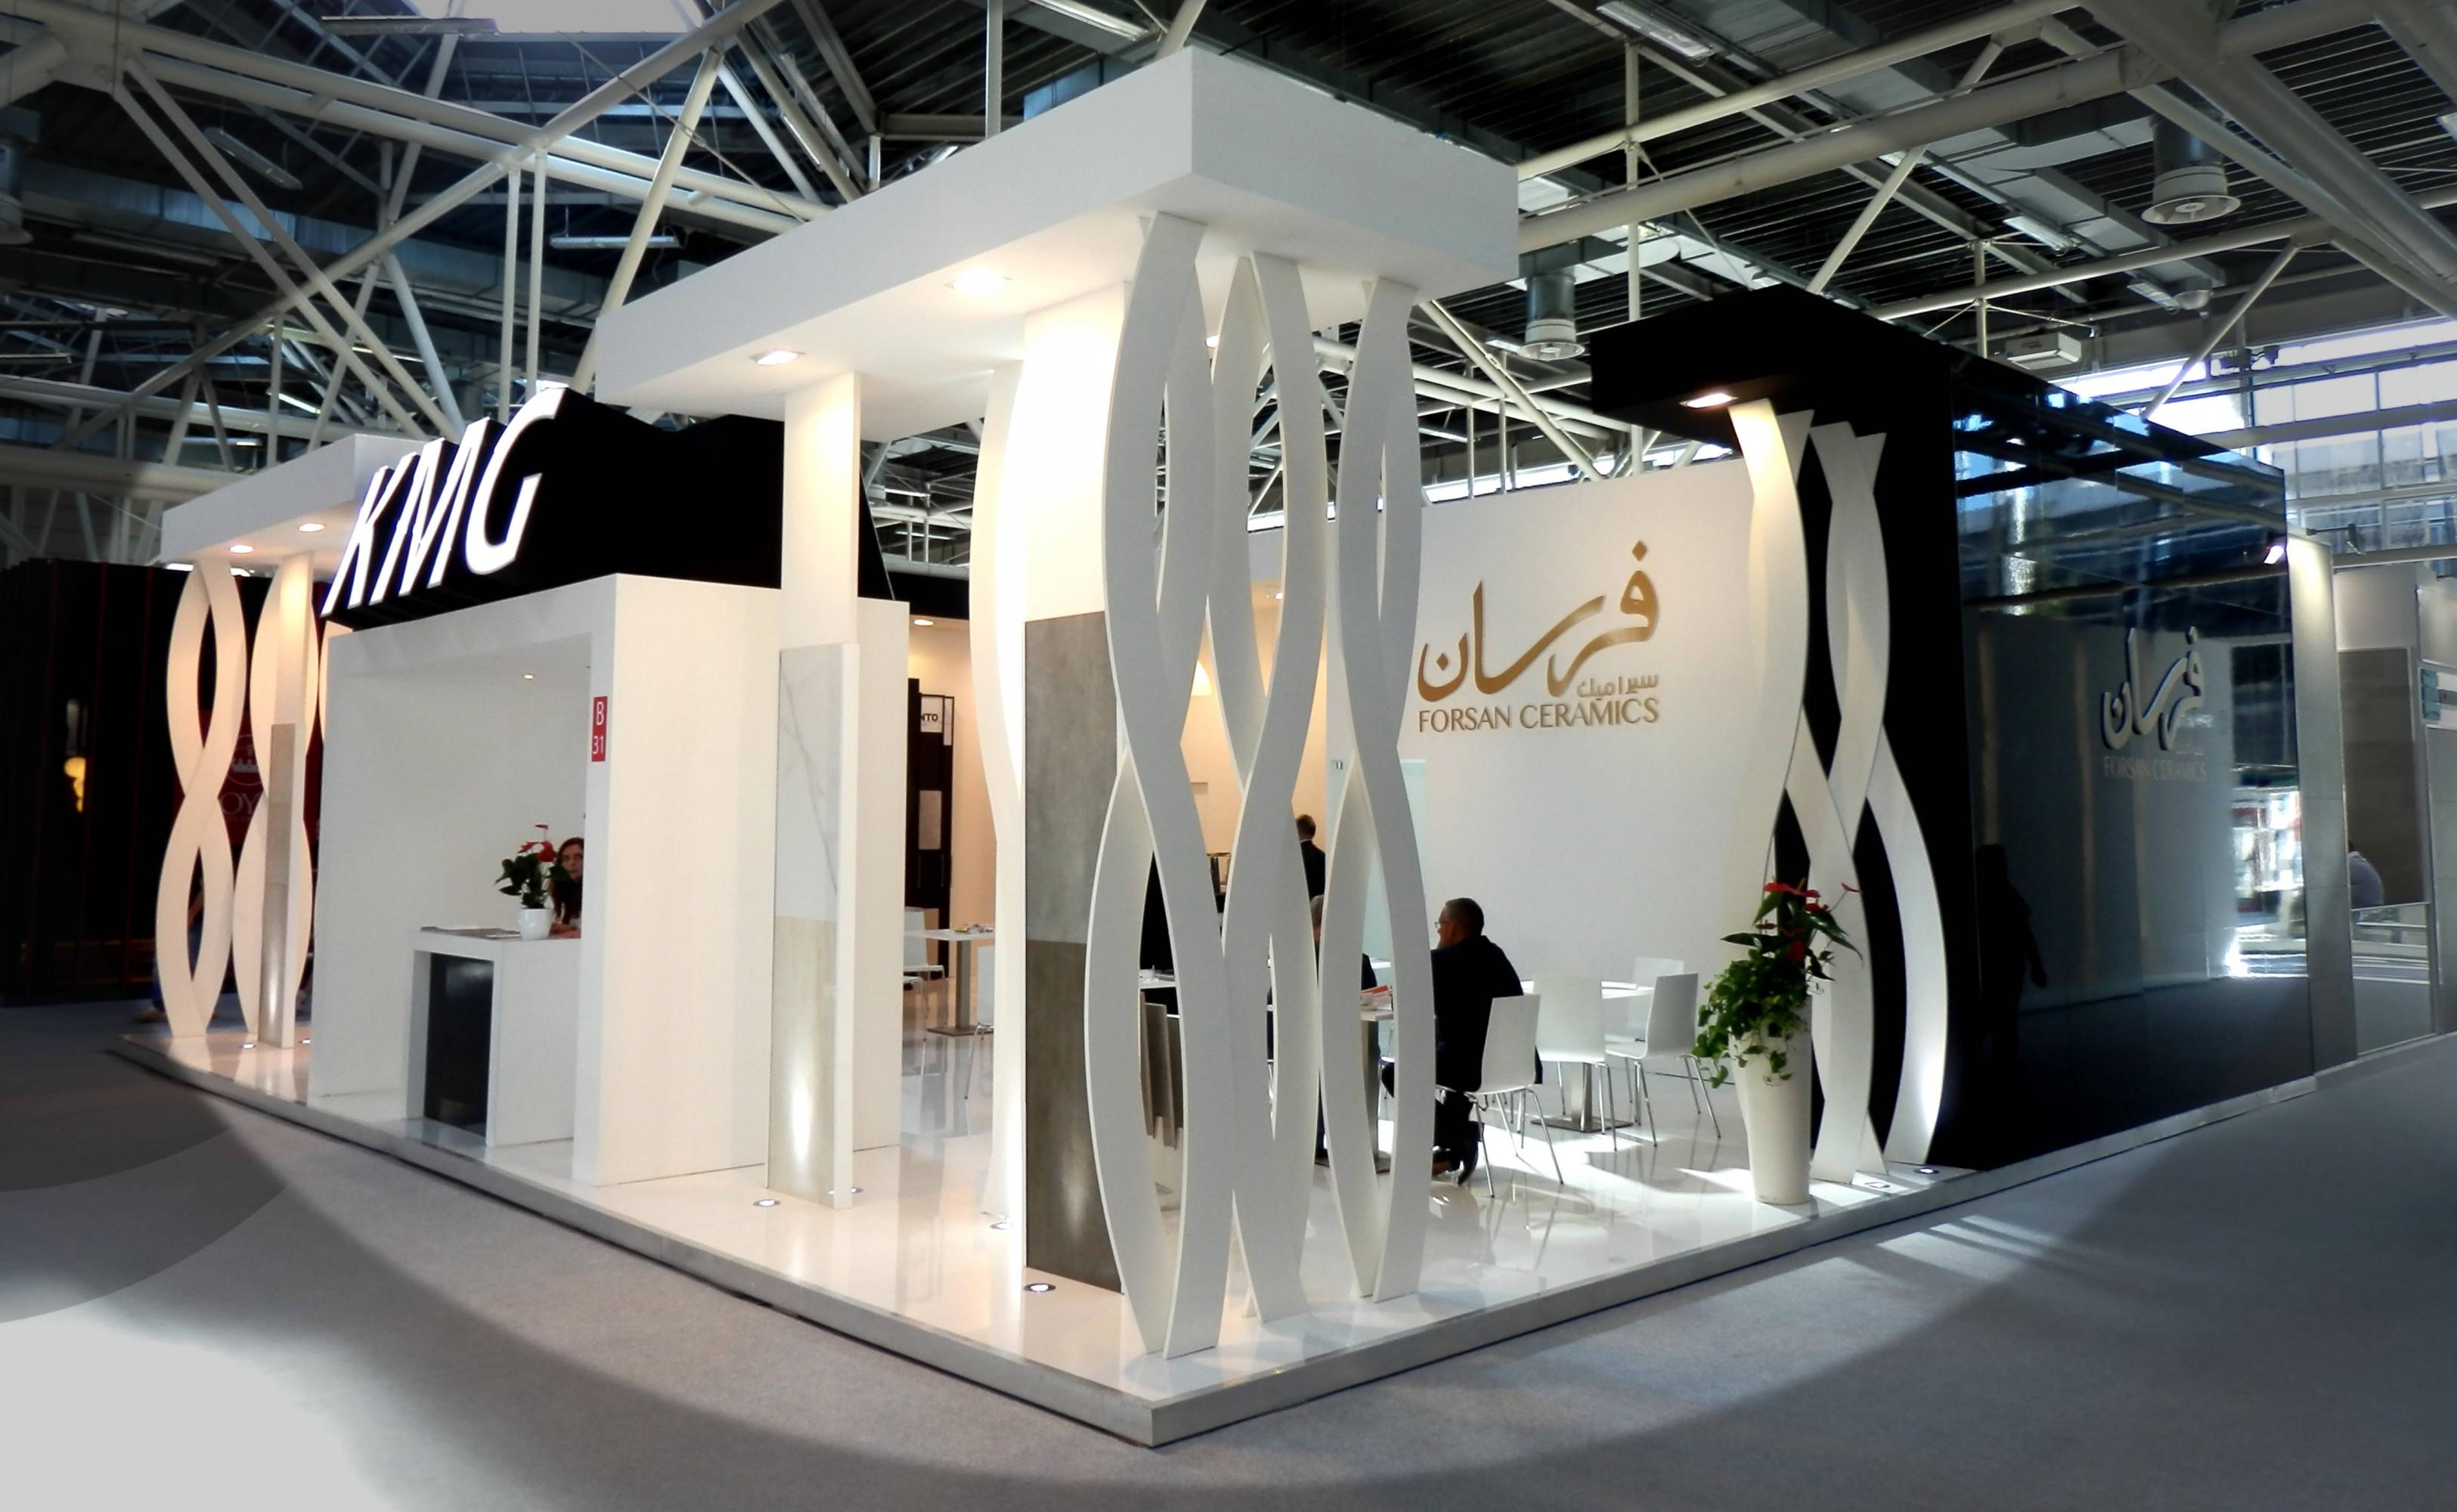 Exhibition Stand Design Hong Kong : Faber design designing and building exhibition stands for trade